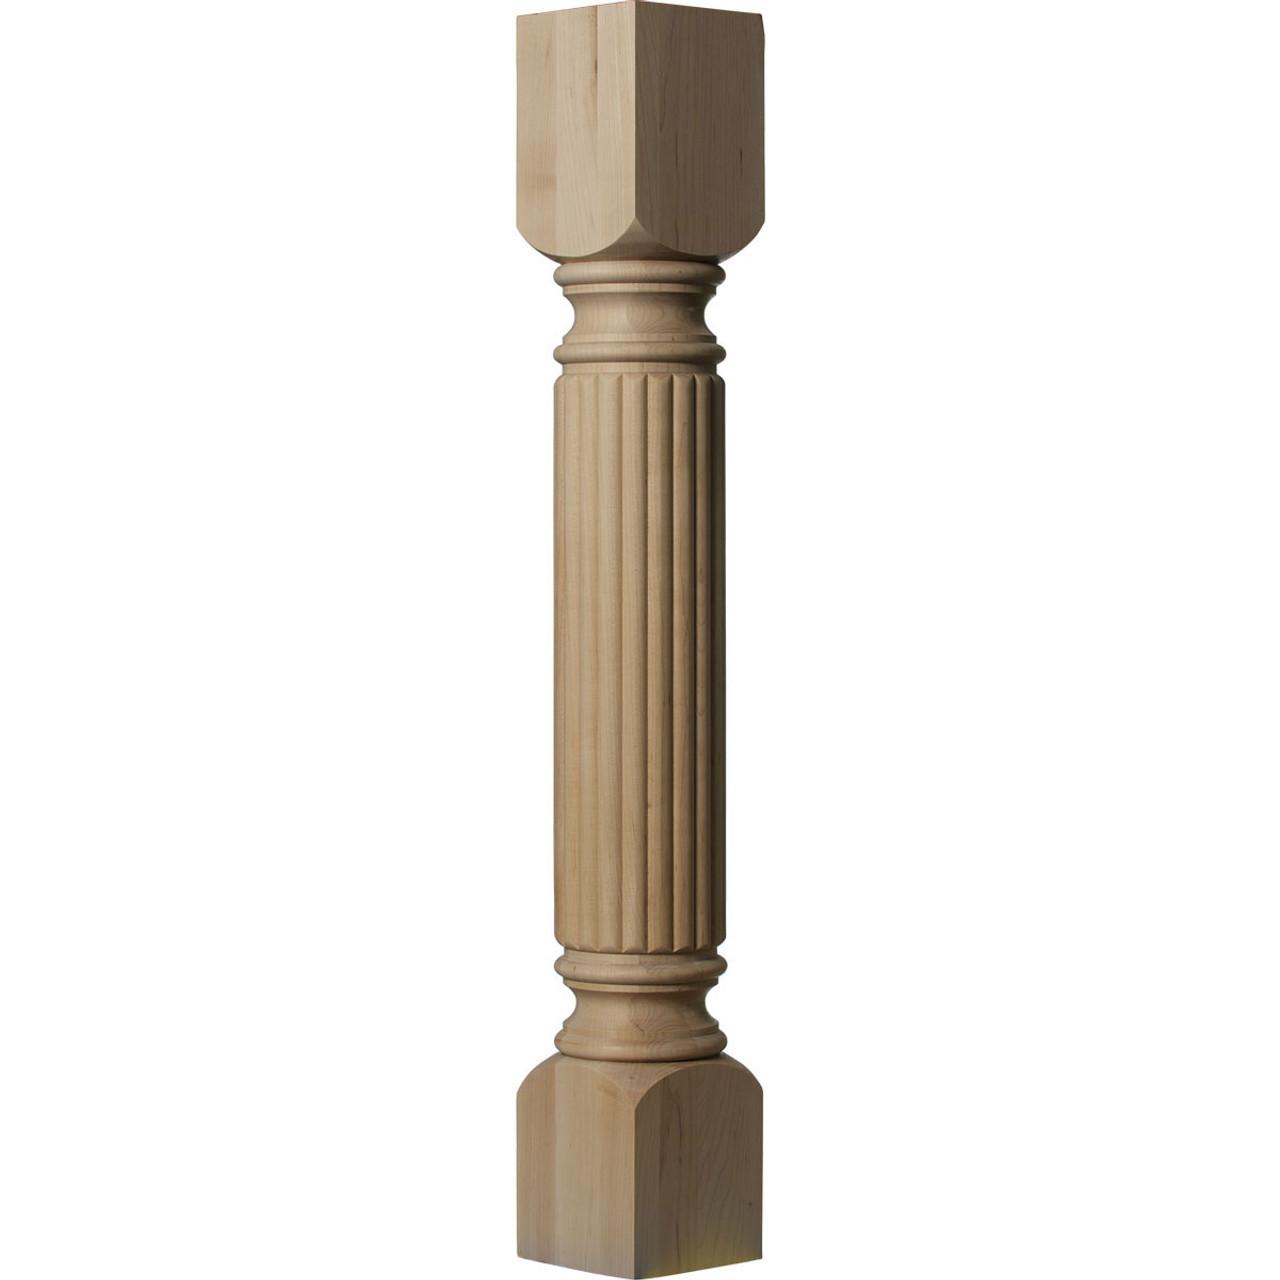 "Raymond Reeded Cabinet Column 5"" Version"